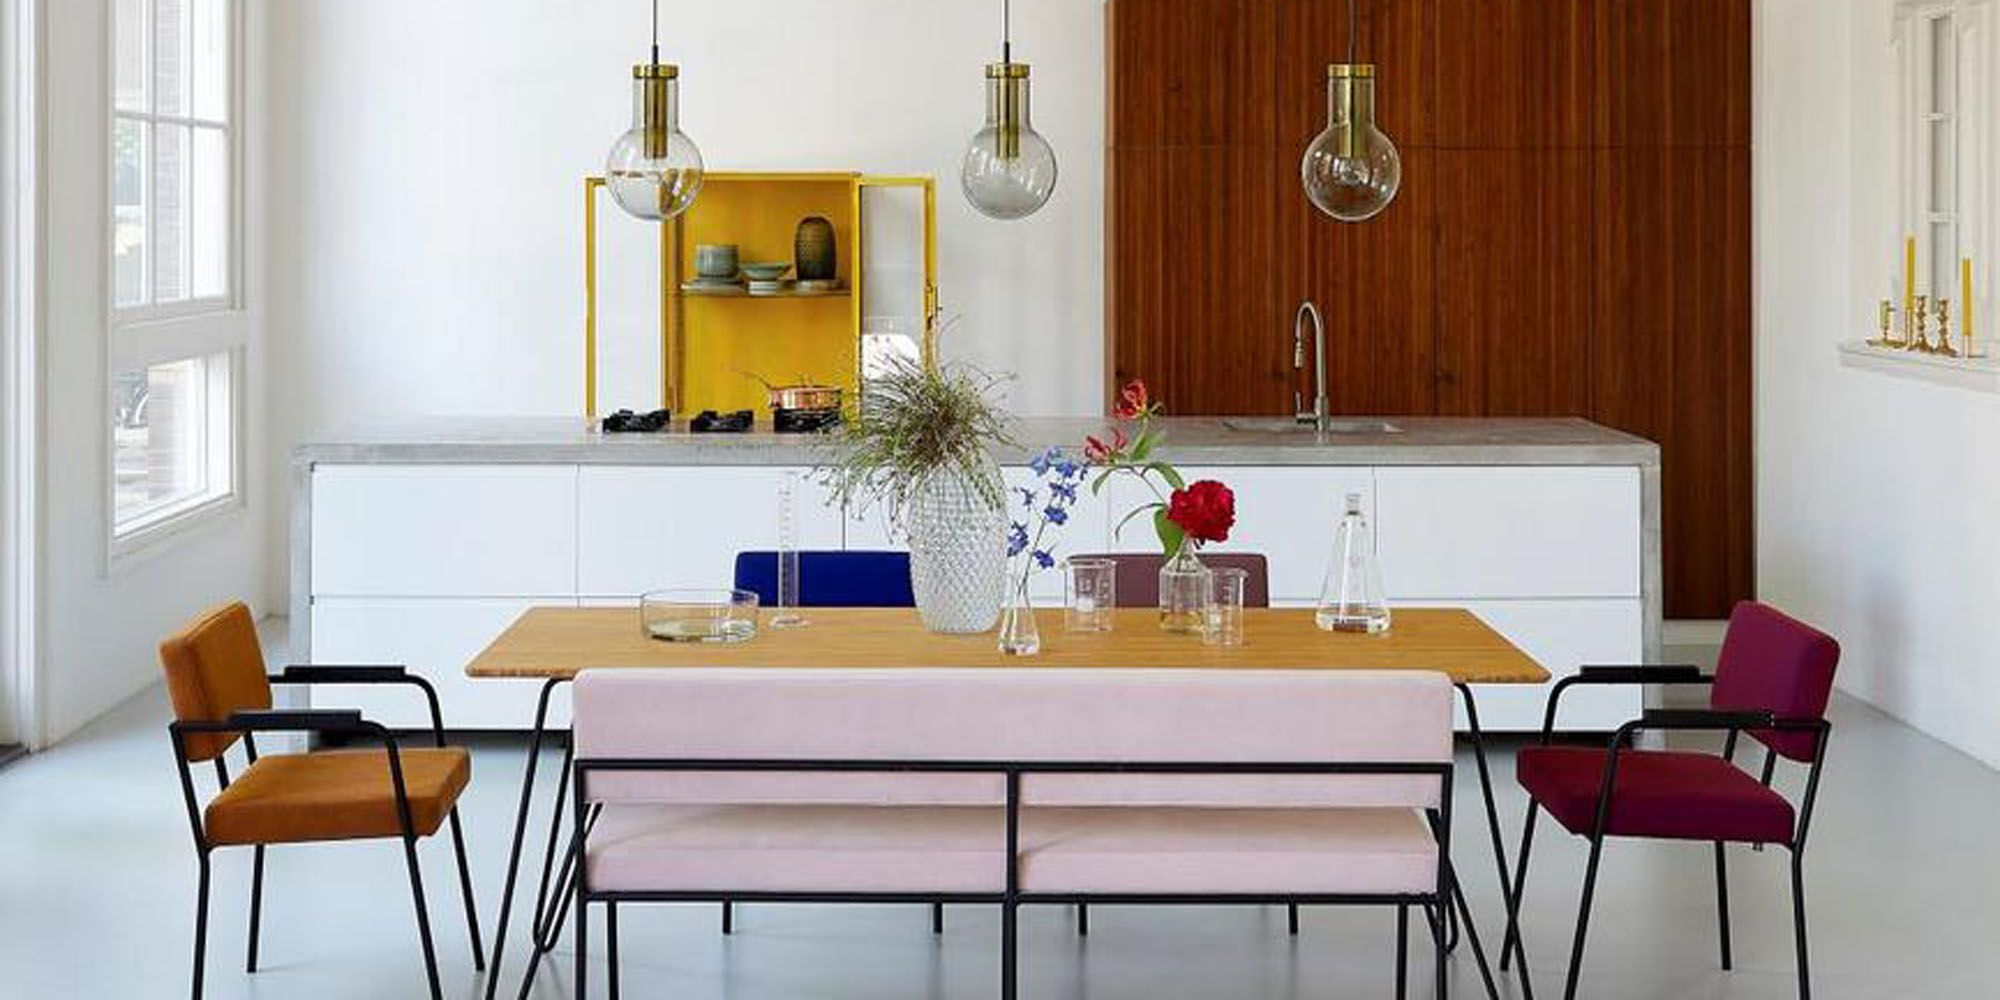 interieurwinkels, hotspots, vintage, winkels, design, interieur,